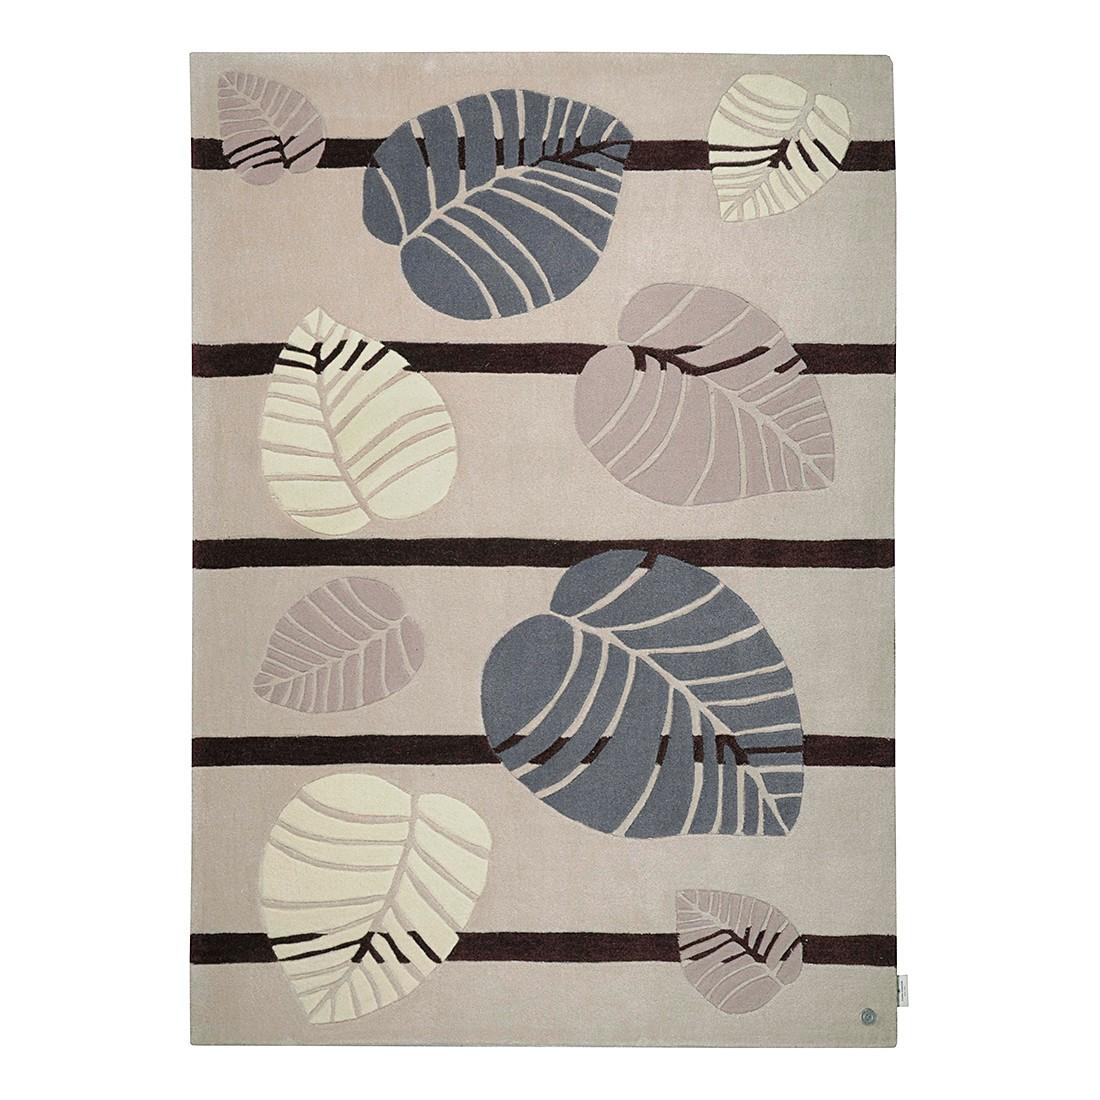 Teppich Life Leaf – Beige – Maße: 65 x 135 cm, Tom Tailor günstig